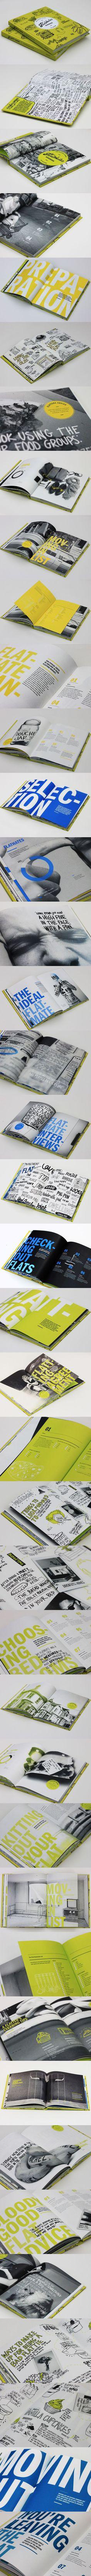 Flatmates Handbook #neon